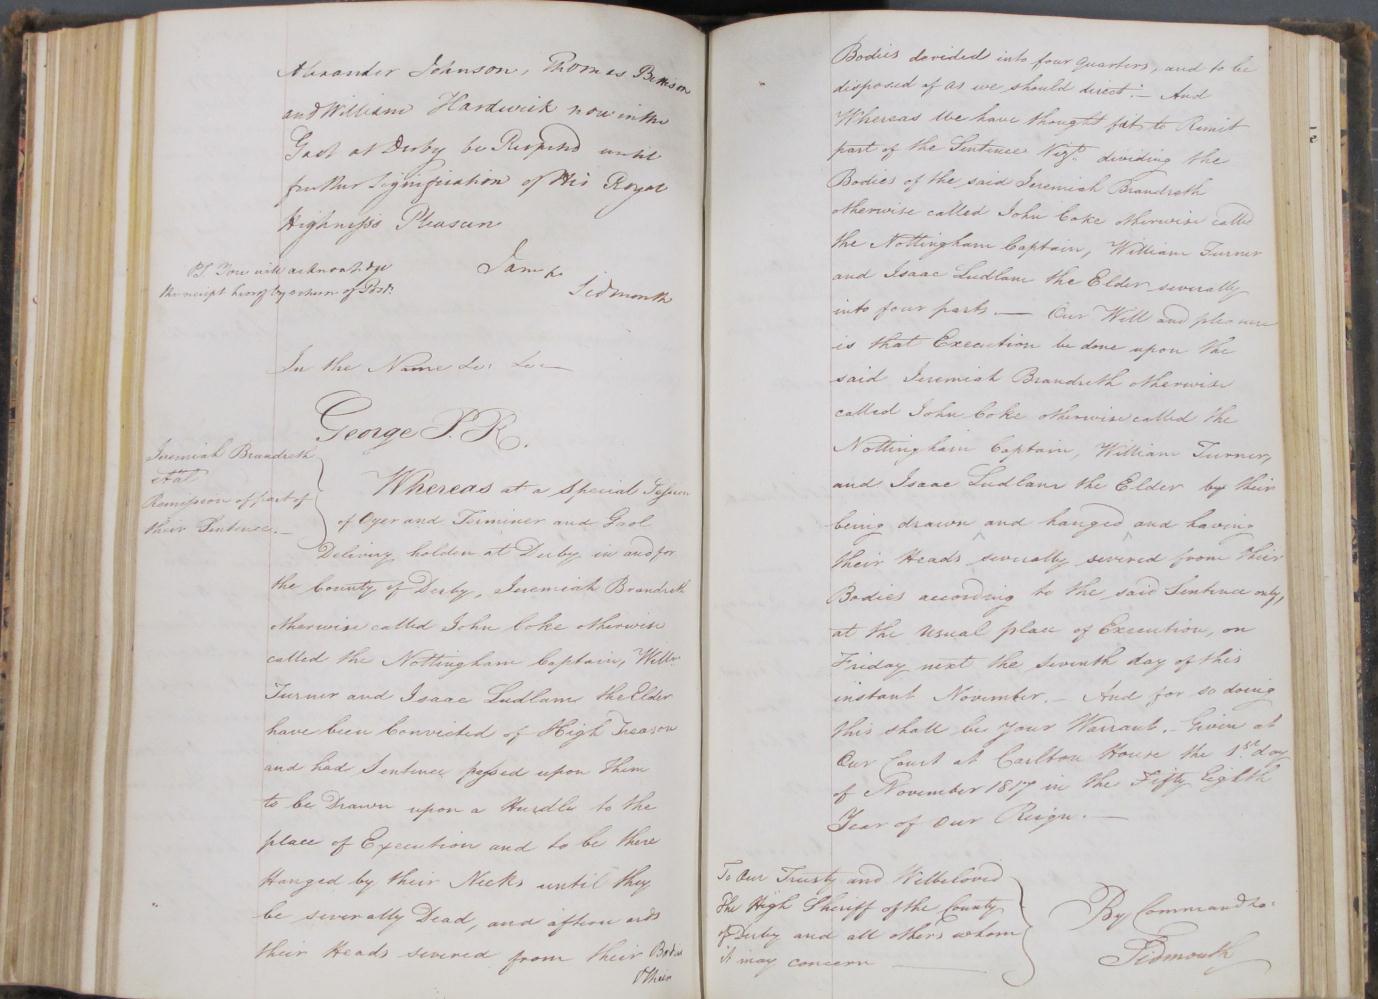 Warrant for Ludlam, Turner and Brandreth's execution, 1 November 1817 (catalogue reference: HO 79/10)